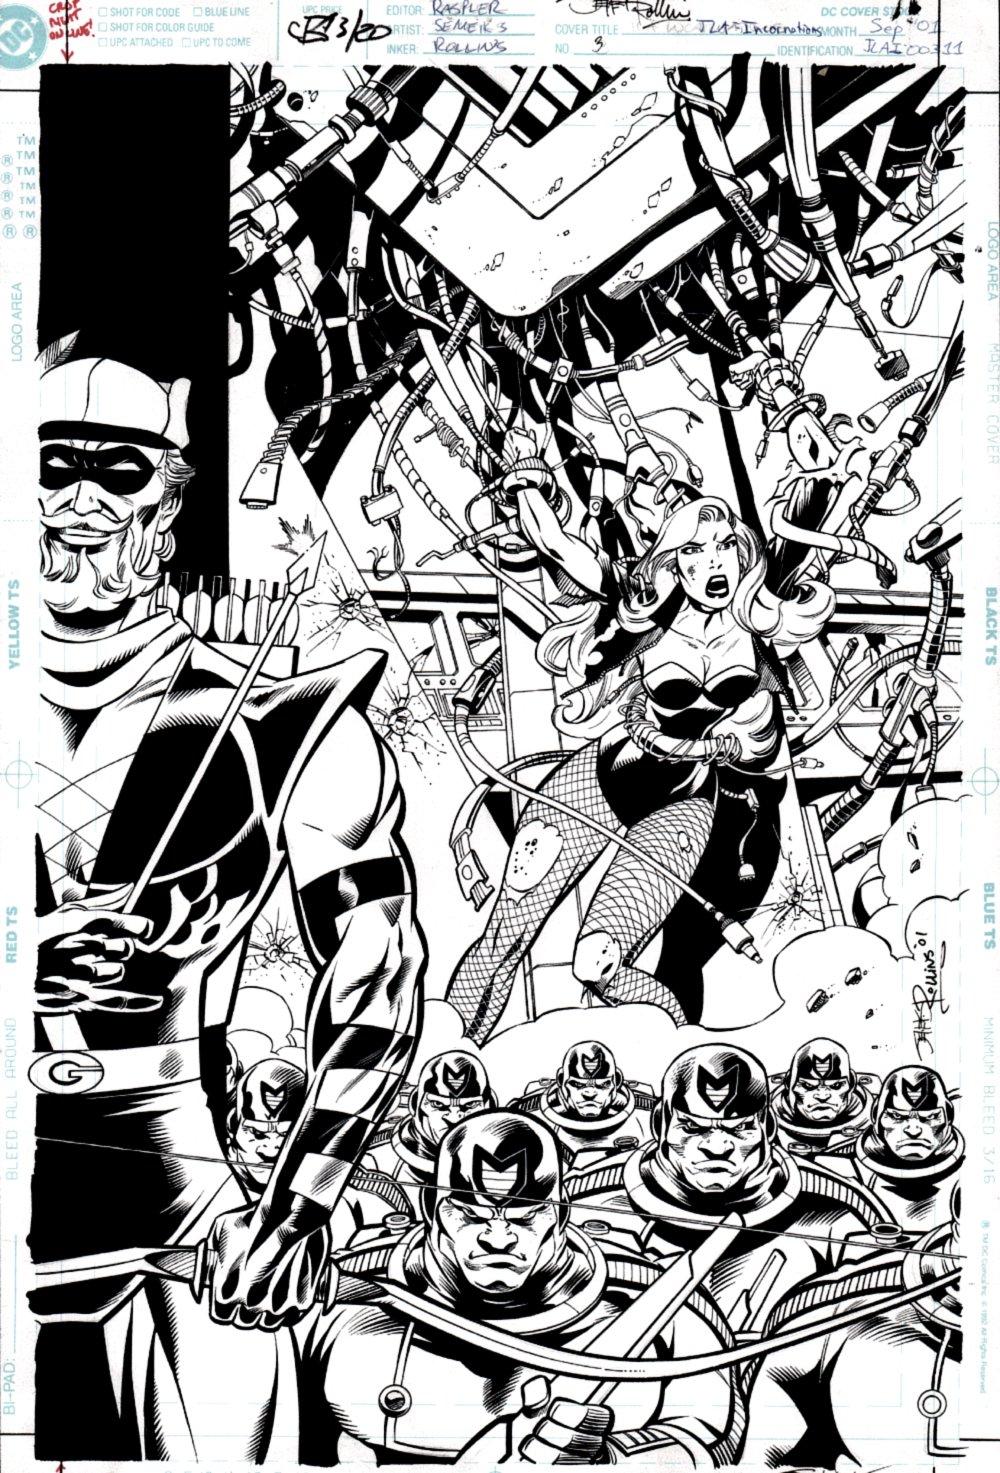 JLA: Incarnations #3 Cover (Black Canary & Green Arrow) 2001